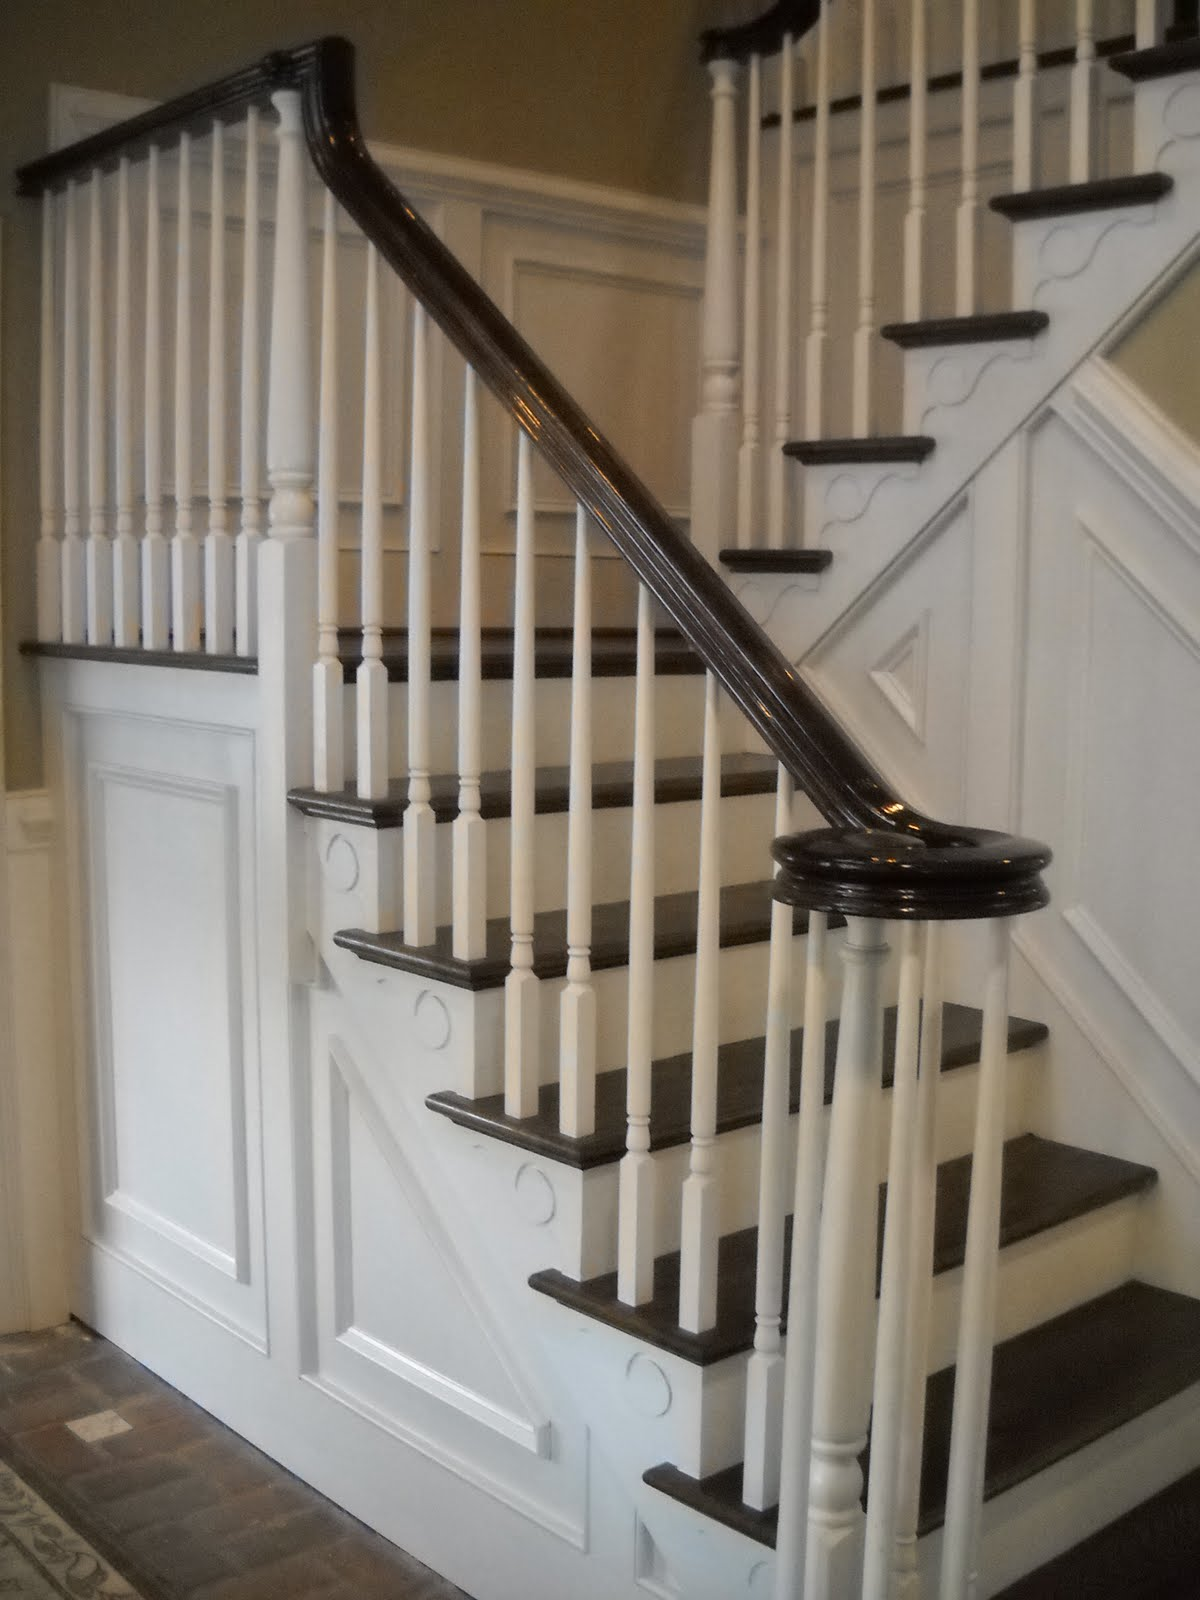 Stairway Renovation Villanova PA, New Stair and Rail